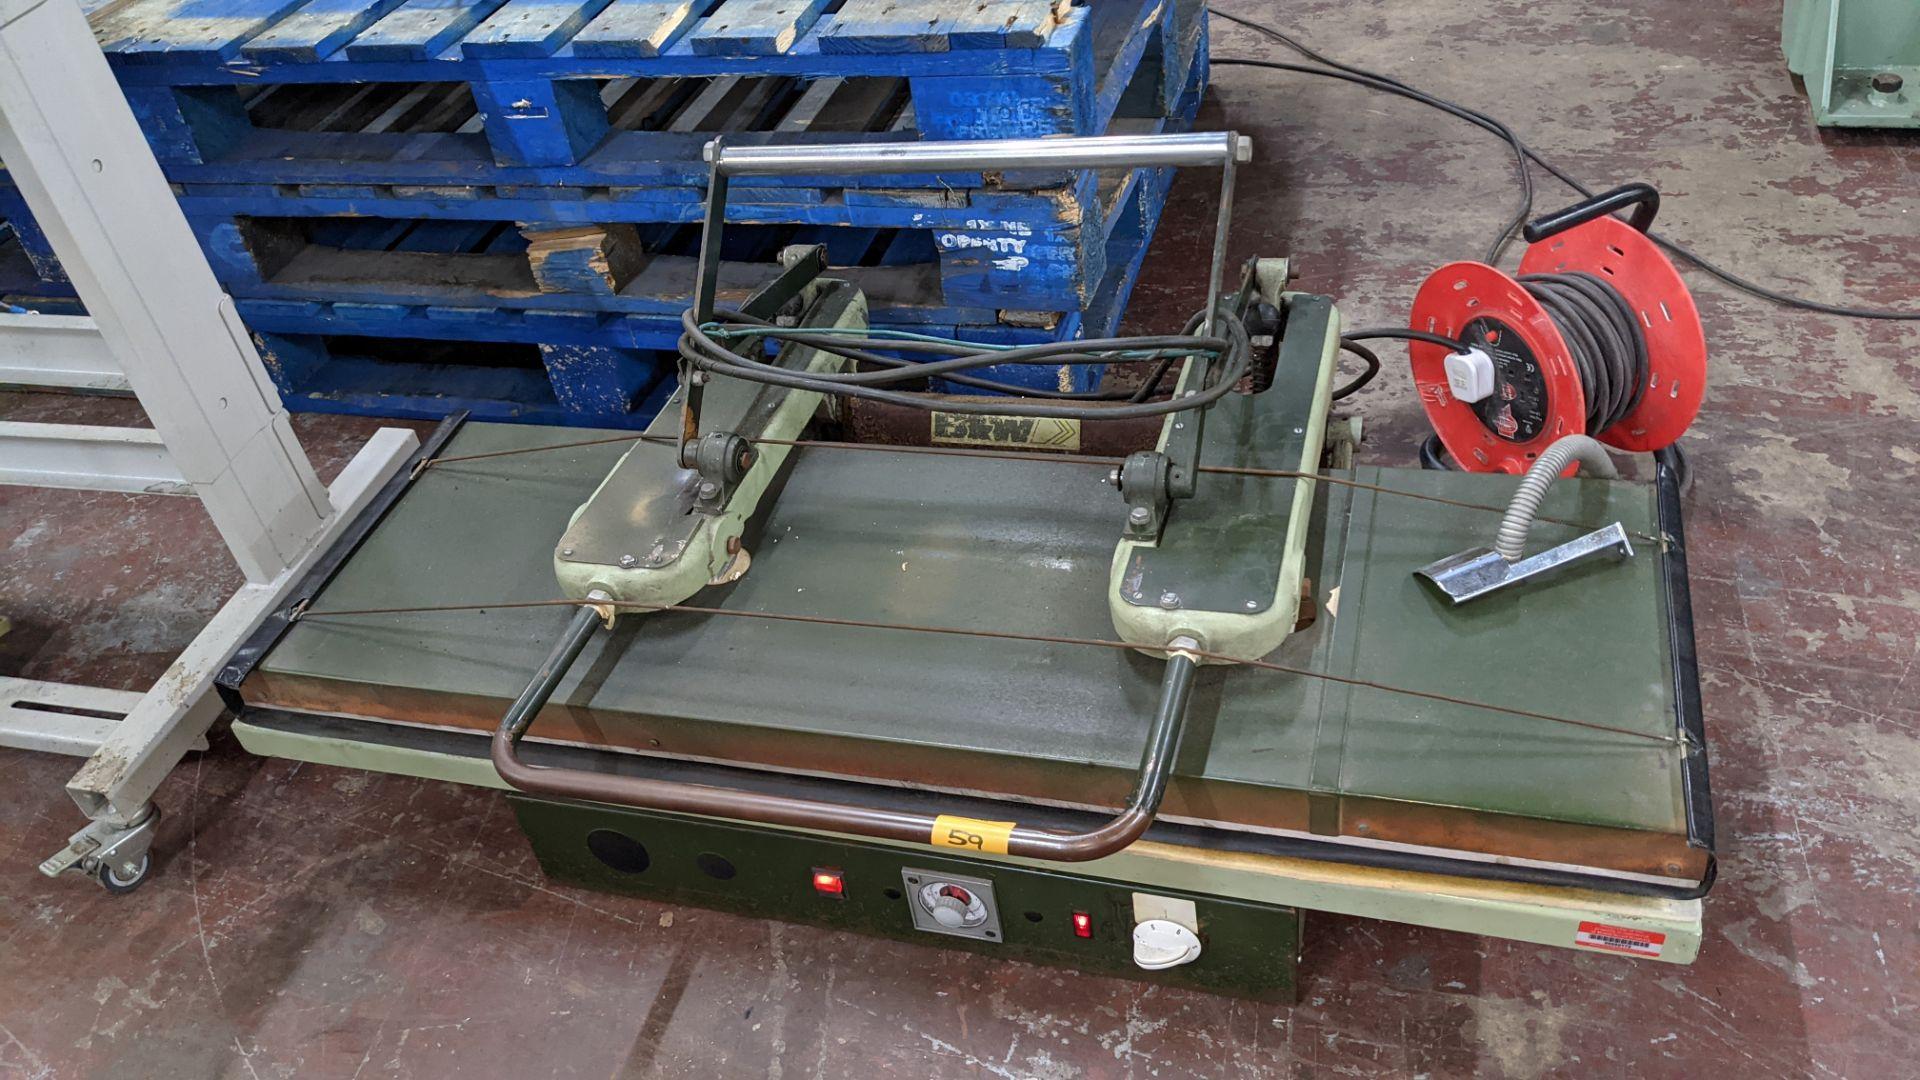 BW large benchtop heat press - Image 10 of 12